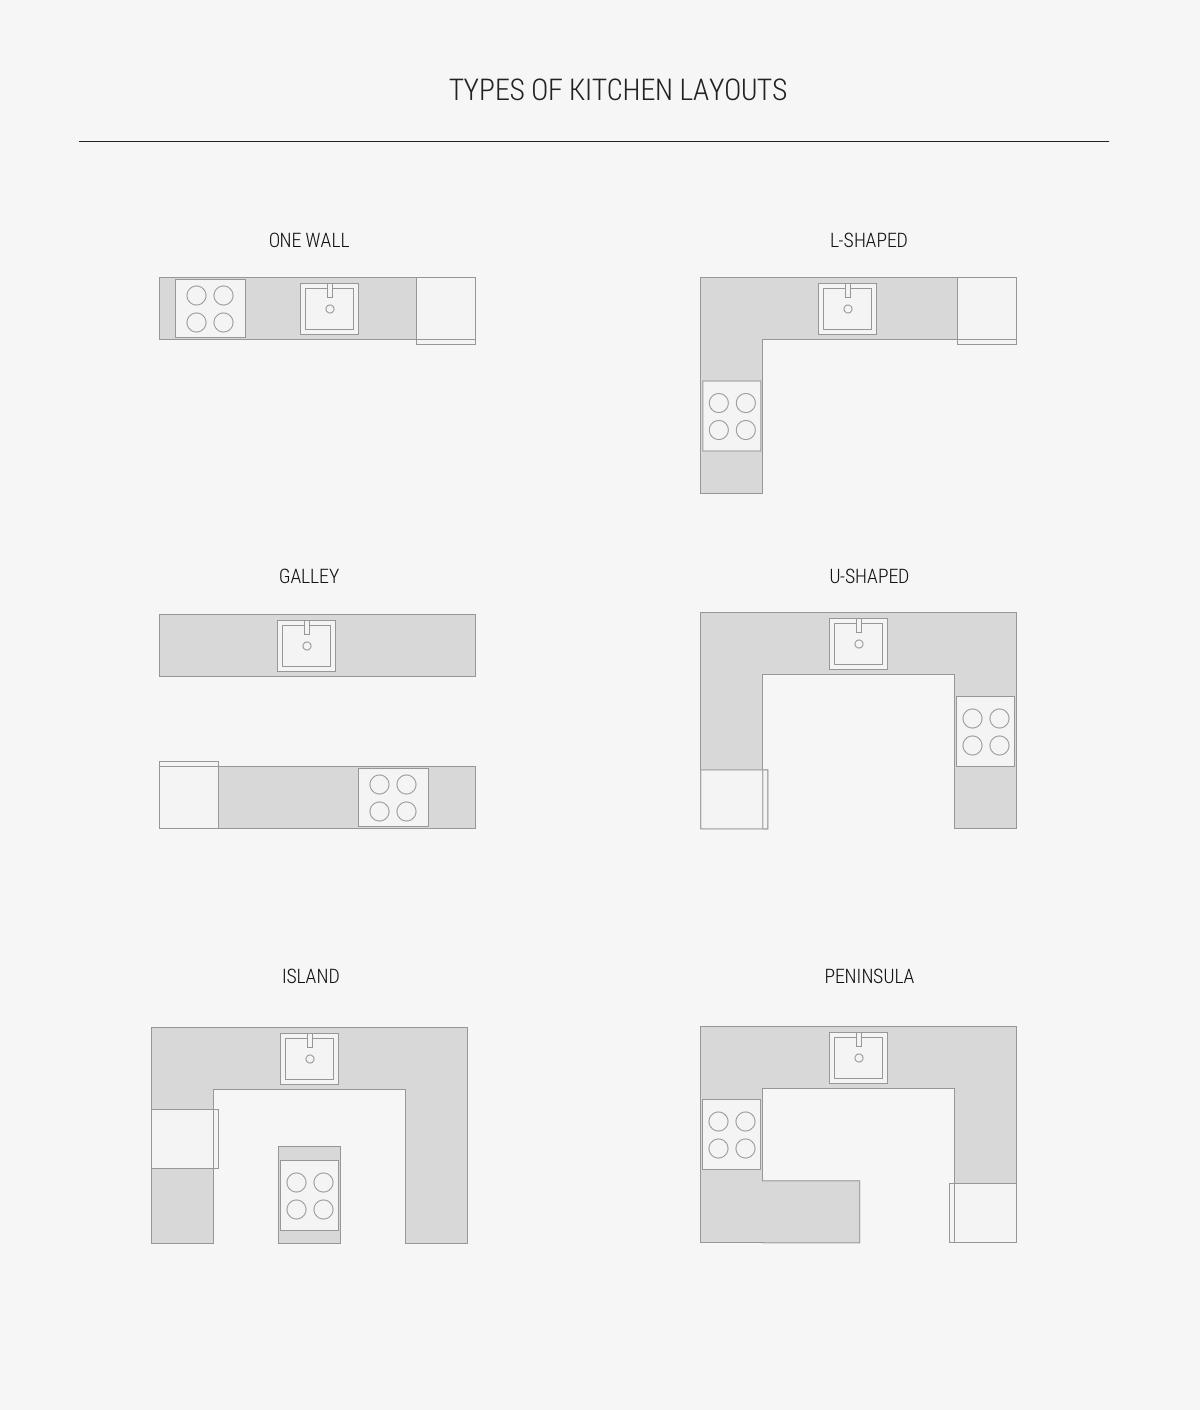 Tipe-tipe dapur - source: http://www.home-designing.com/